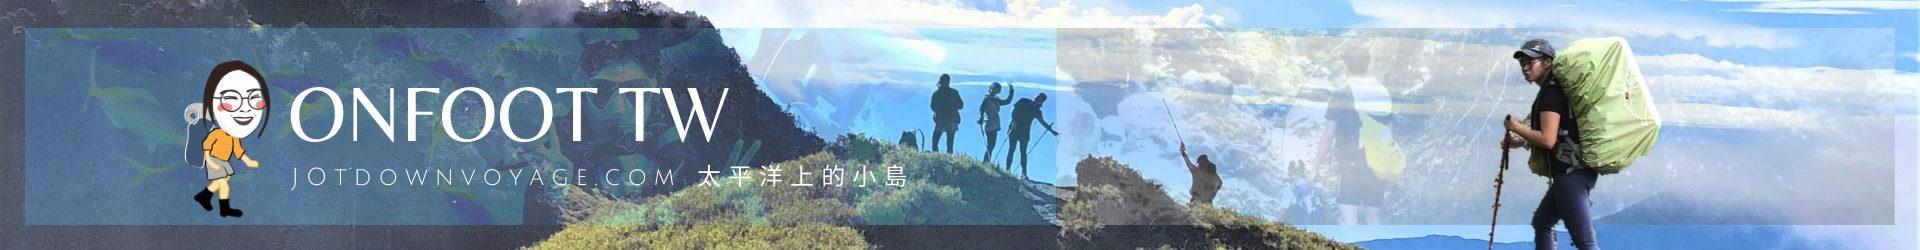 Jot Down Voyage 台灣